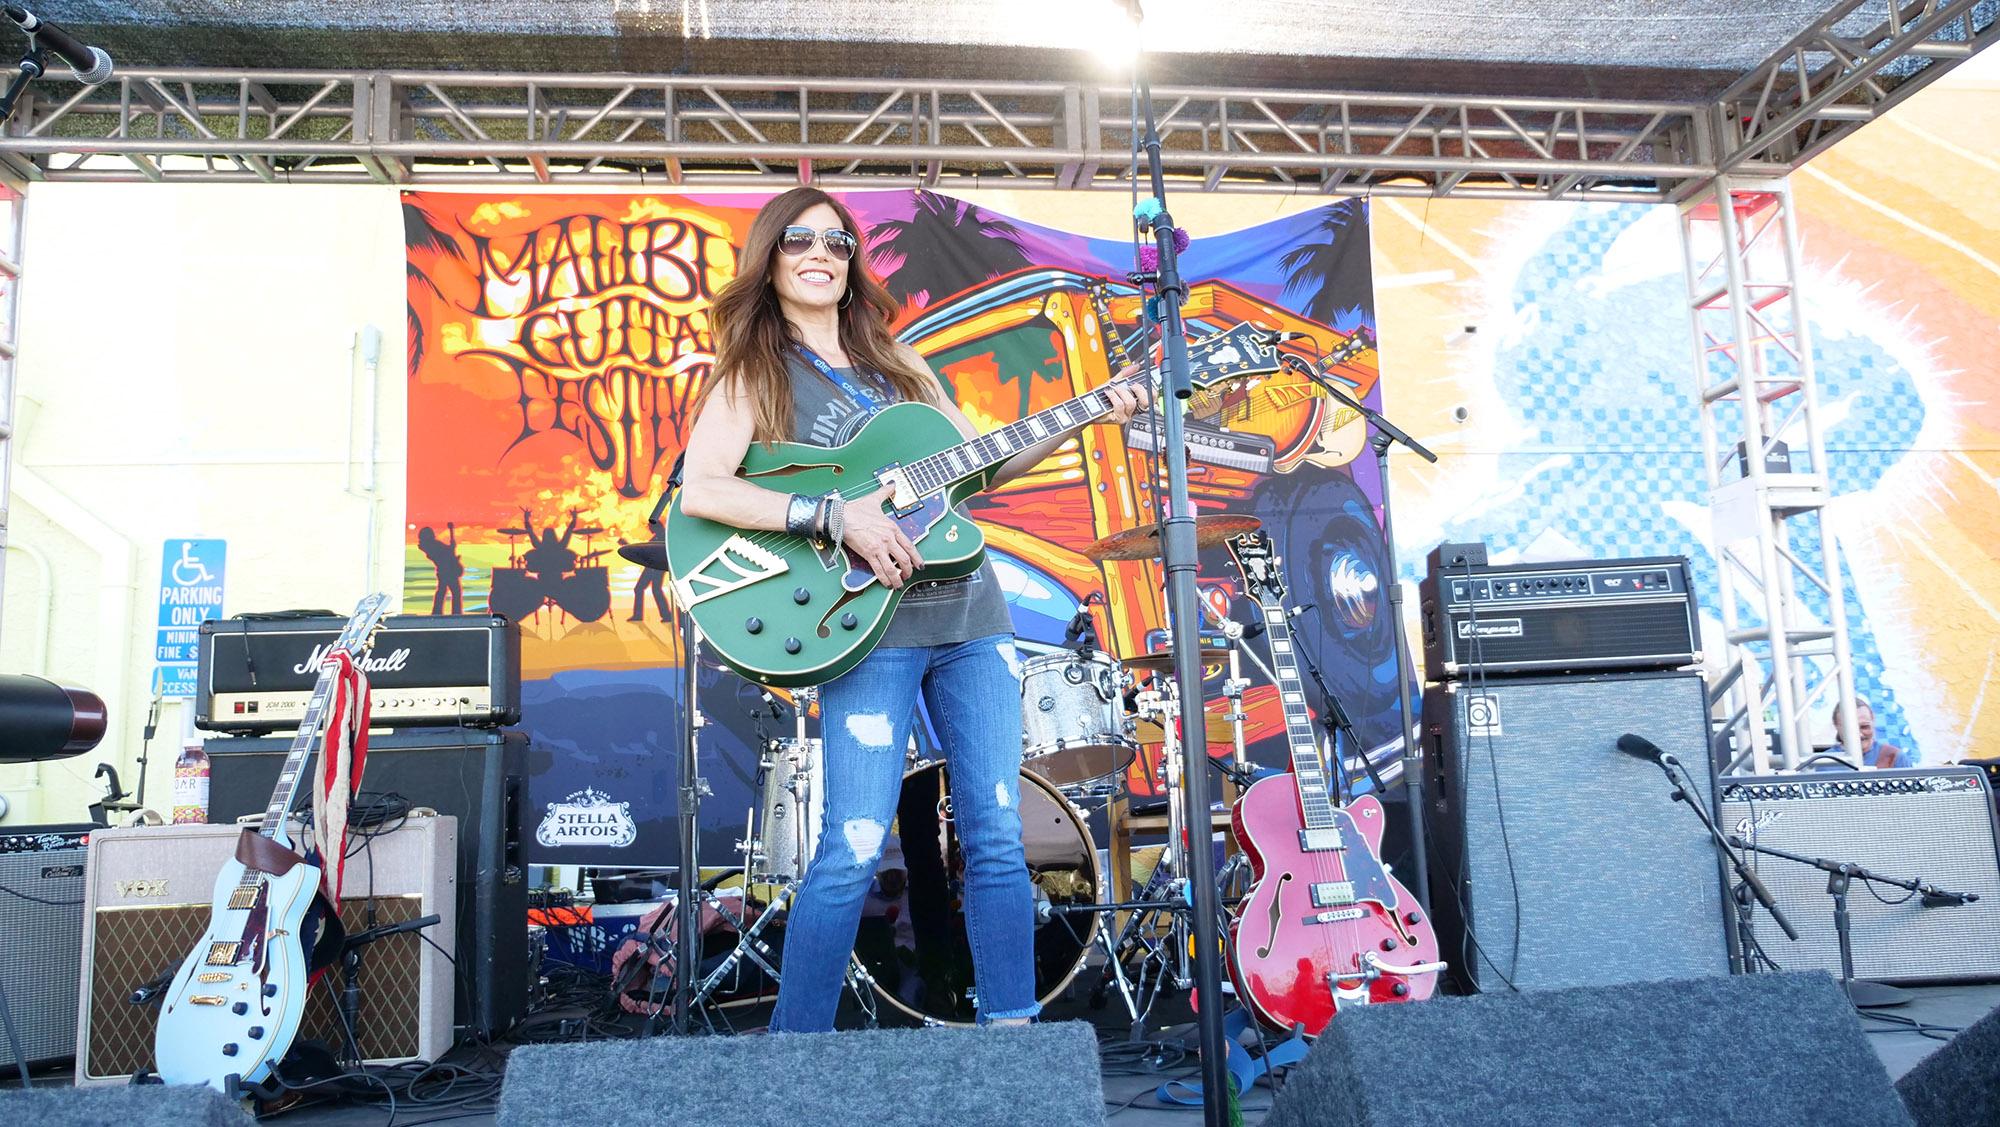 Tambi Guitar Stage.jpg